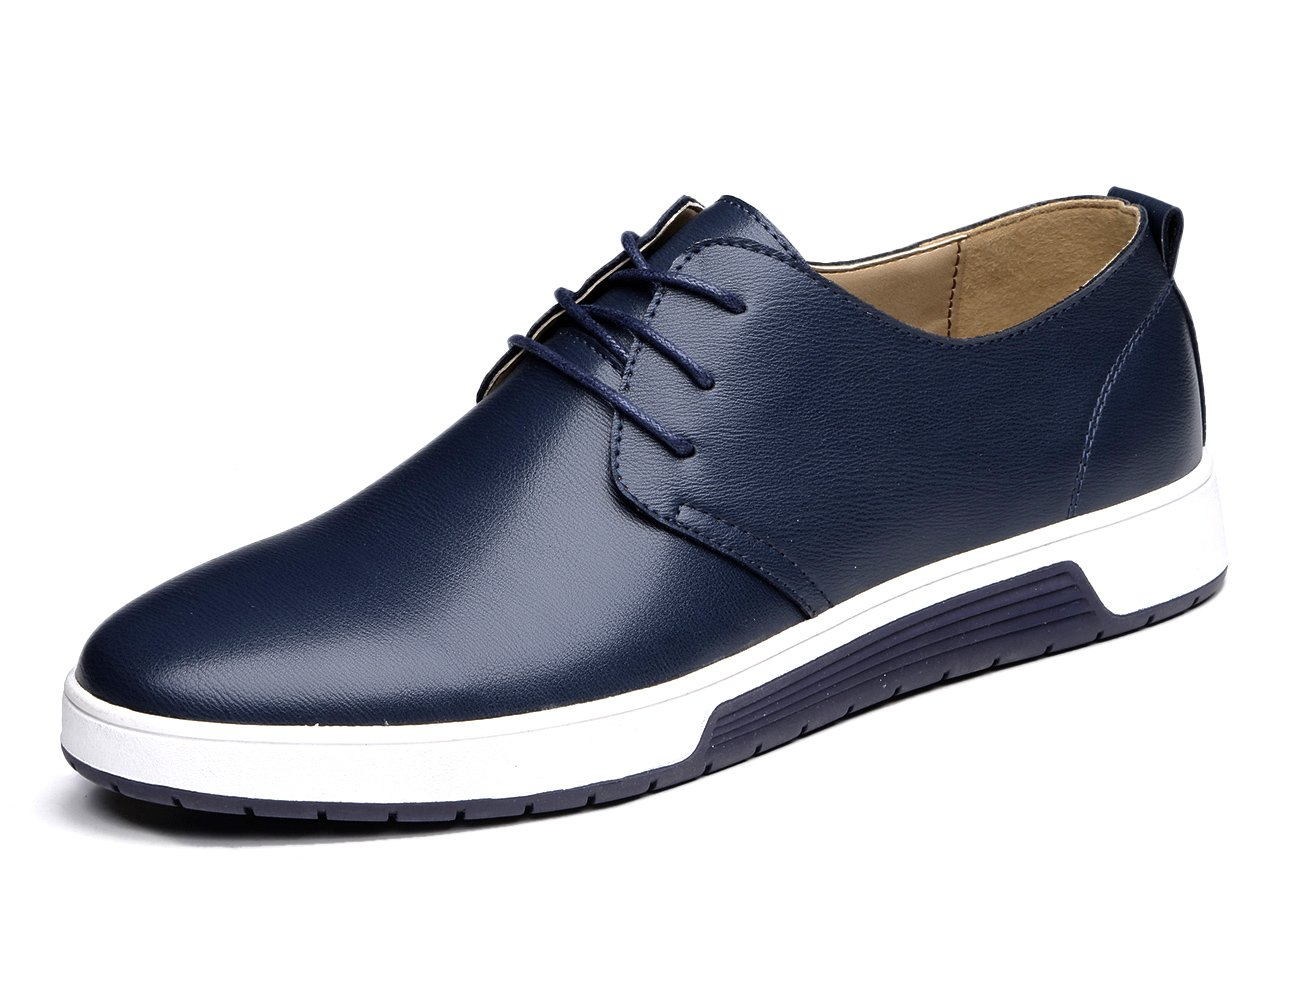 XMWEALTHY Men's British Style Comfortable Flat Dress Shoes Blue US 11